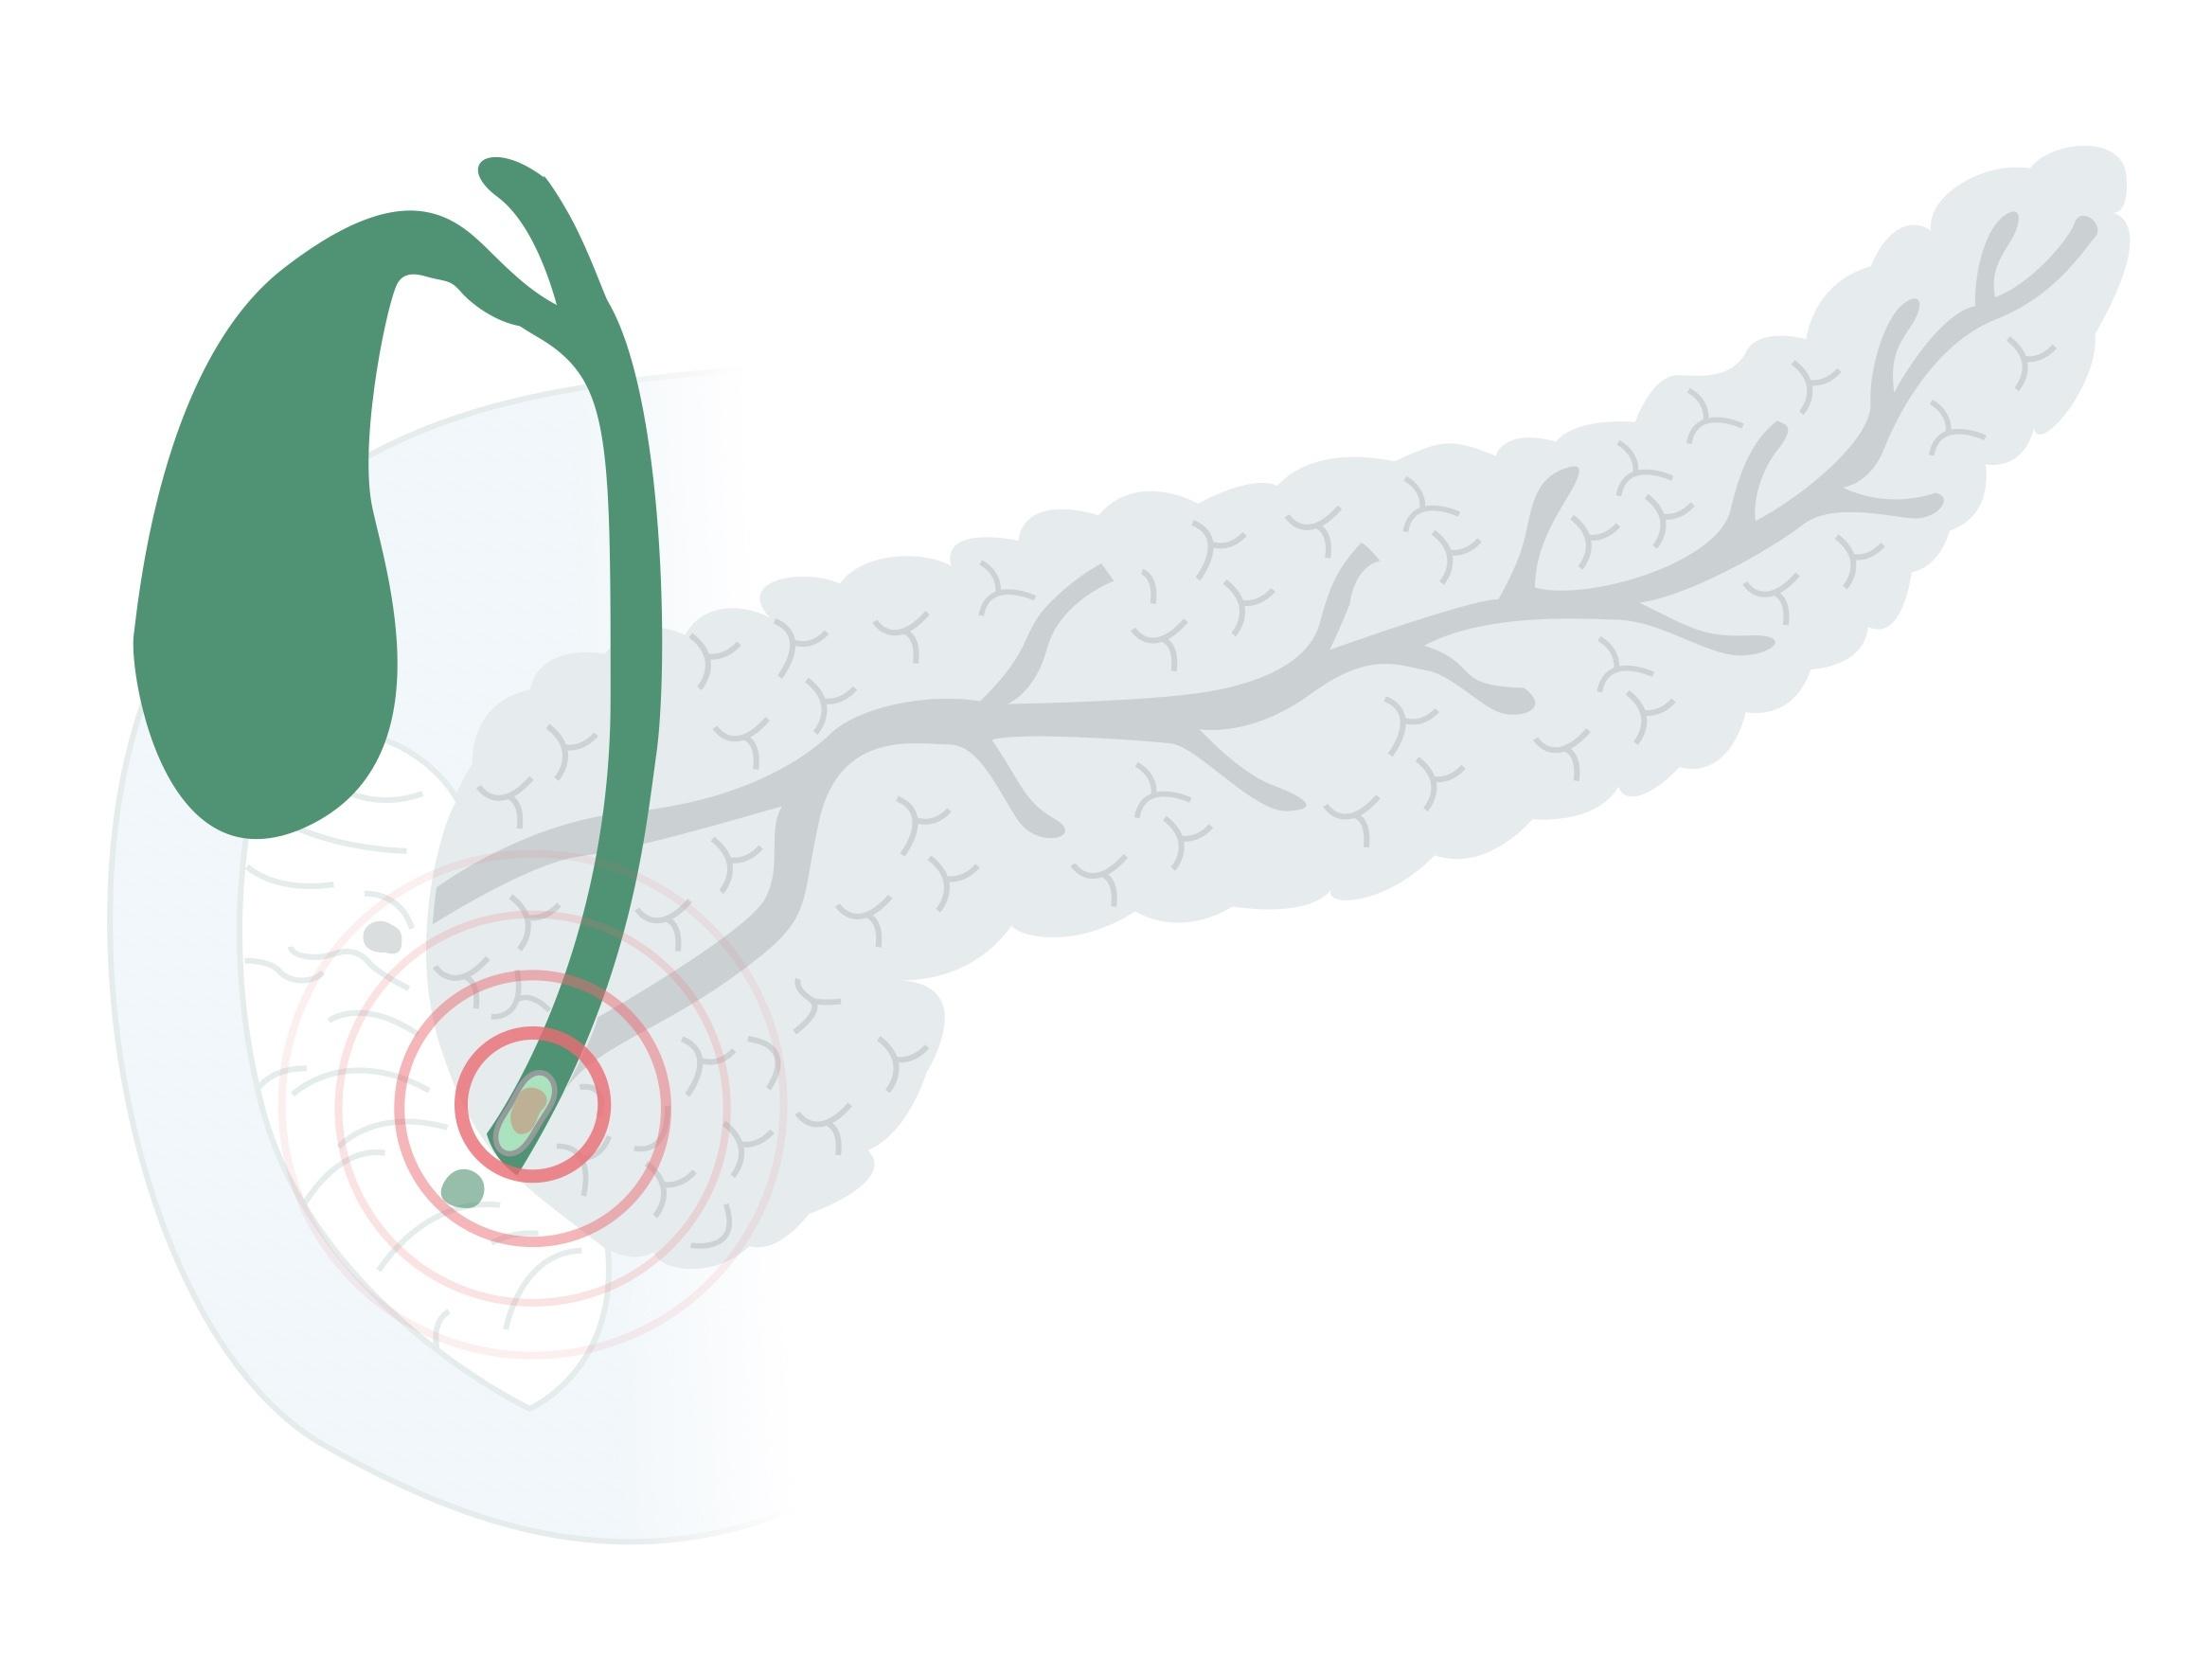 Gallstone in distal duct causing pancreatitis